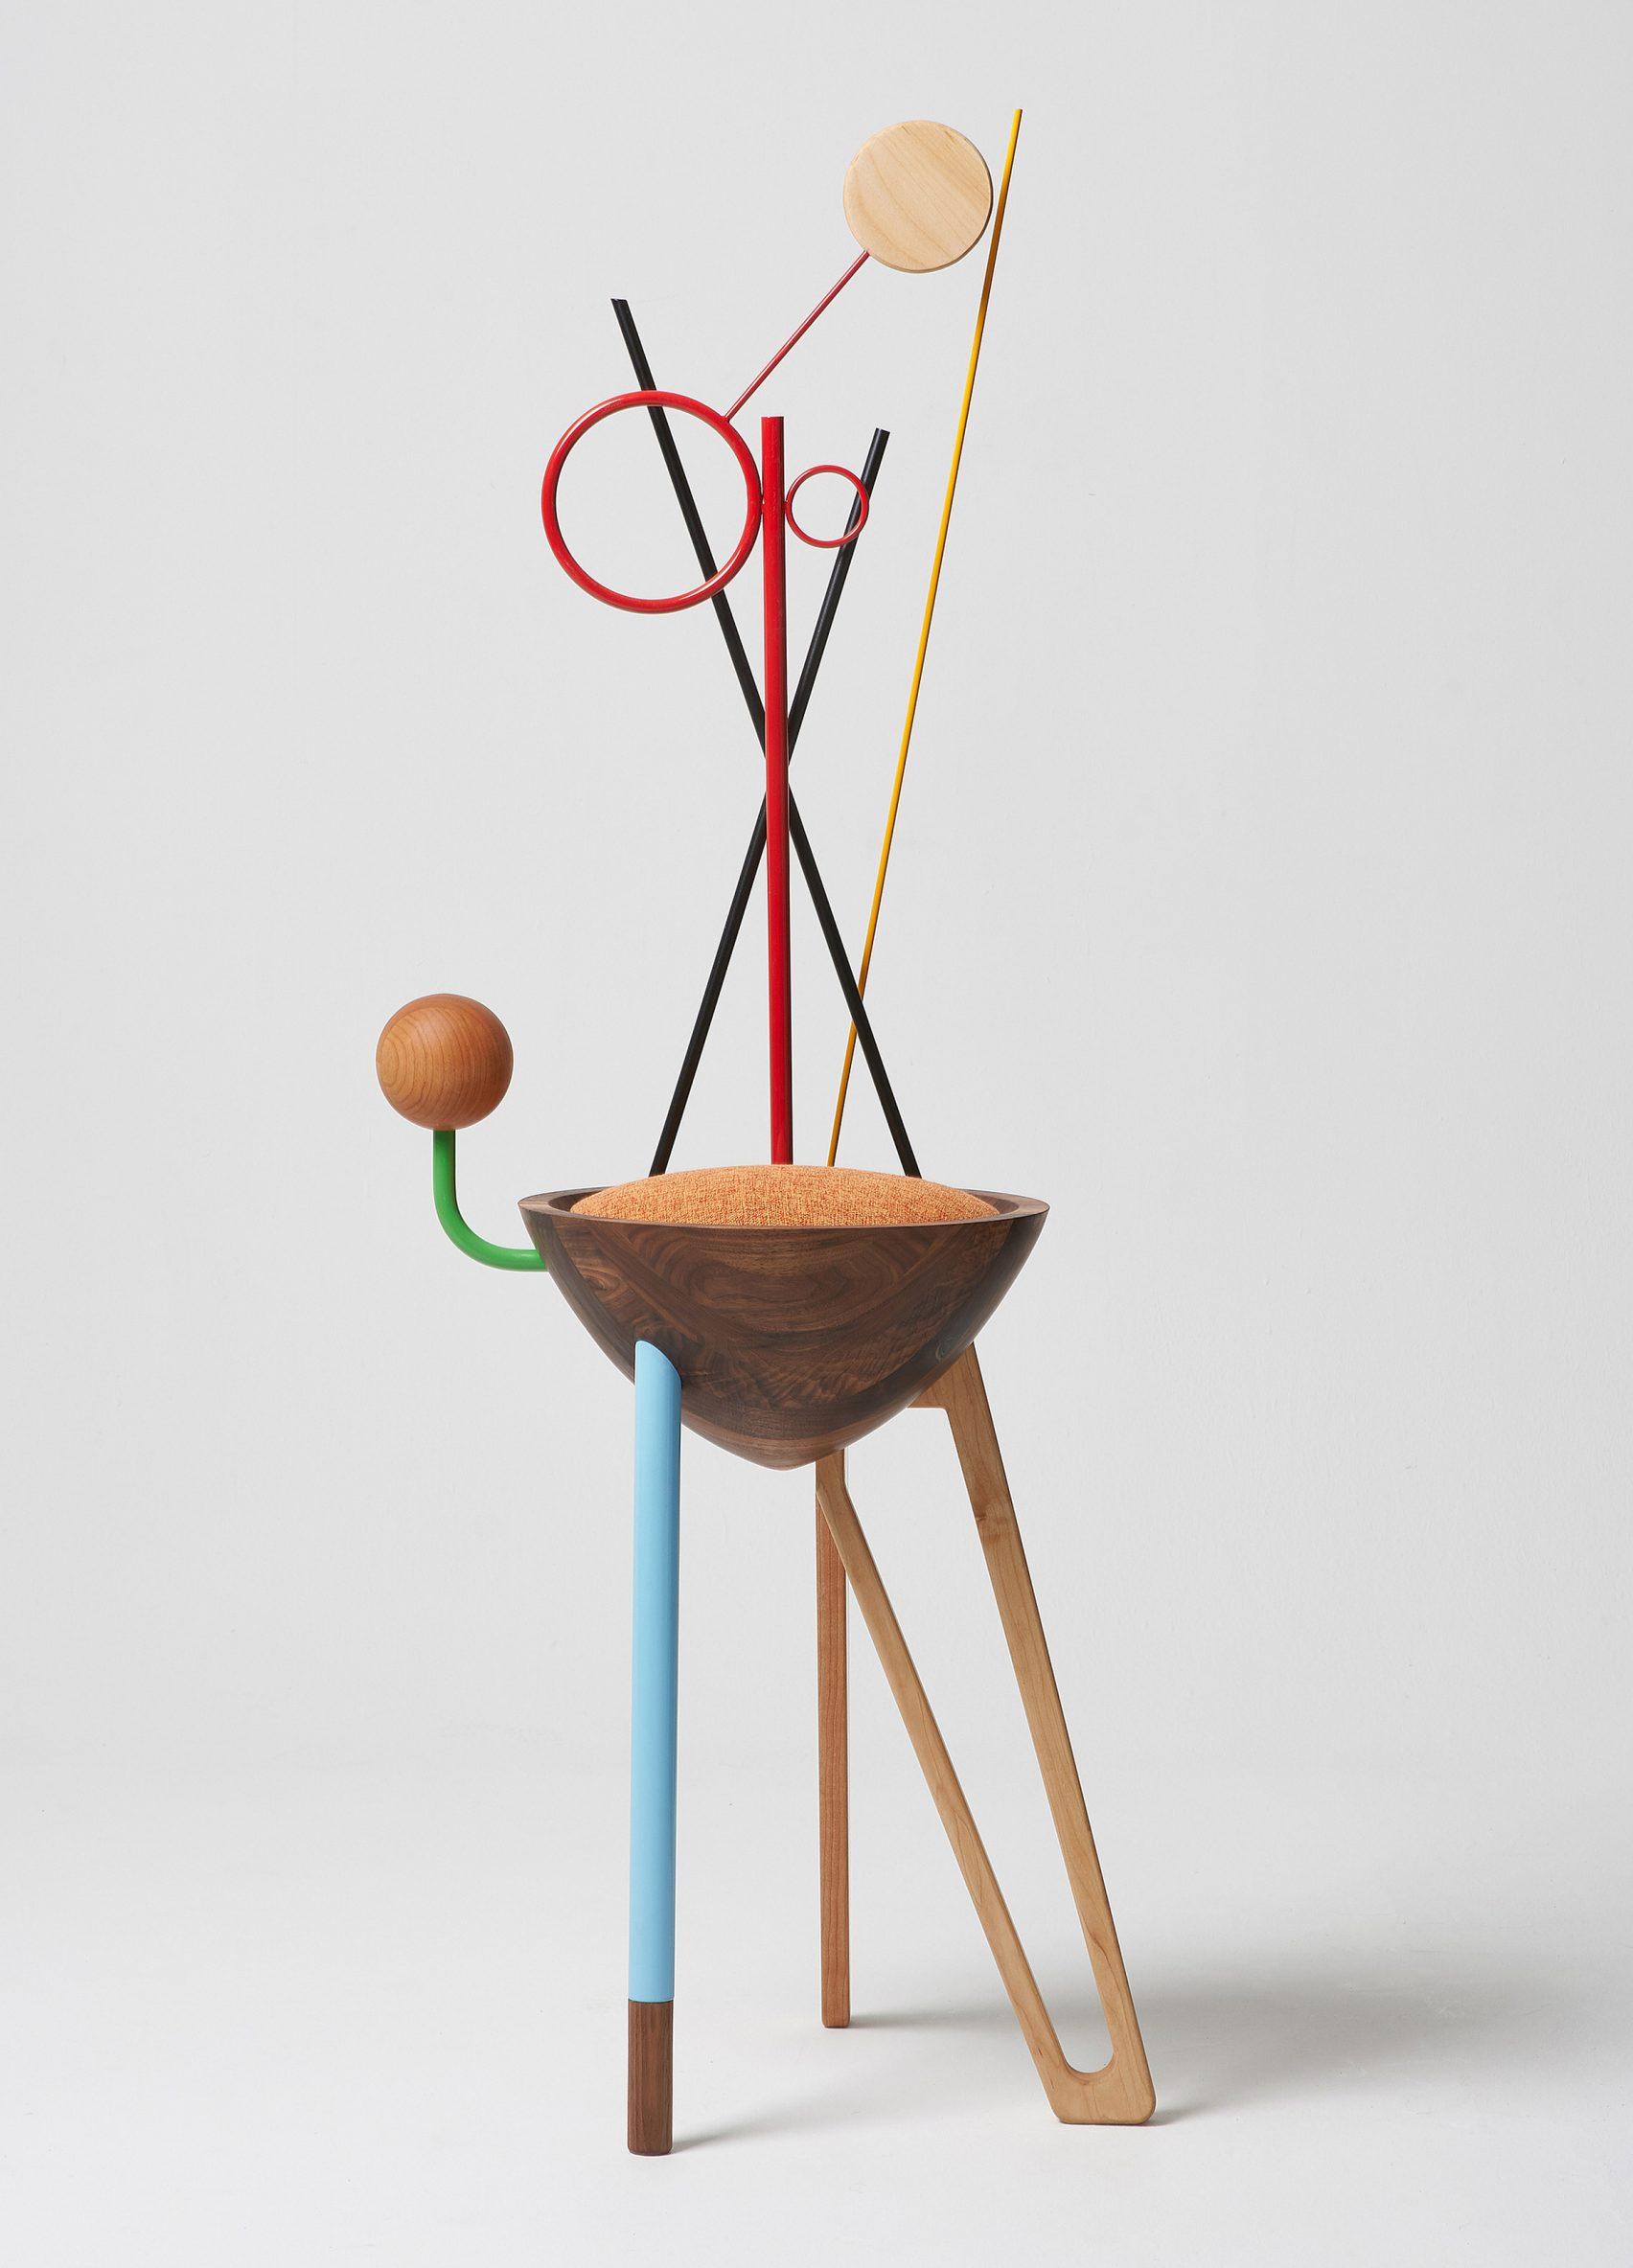 russian-avangard-in-contemporary-design-02